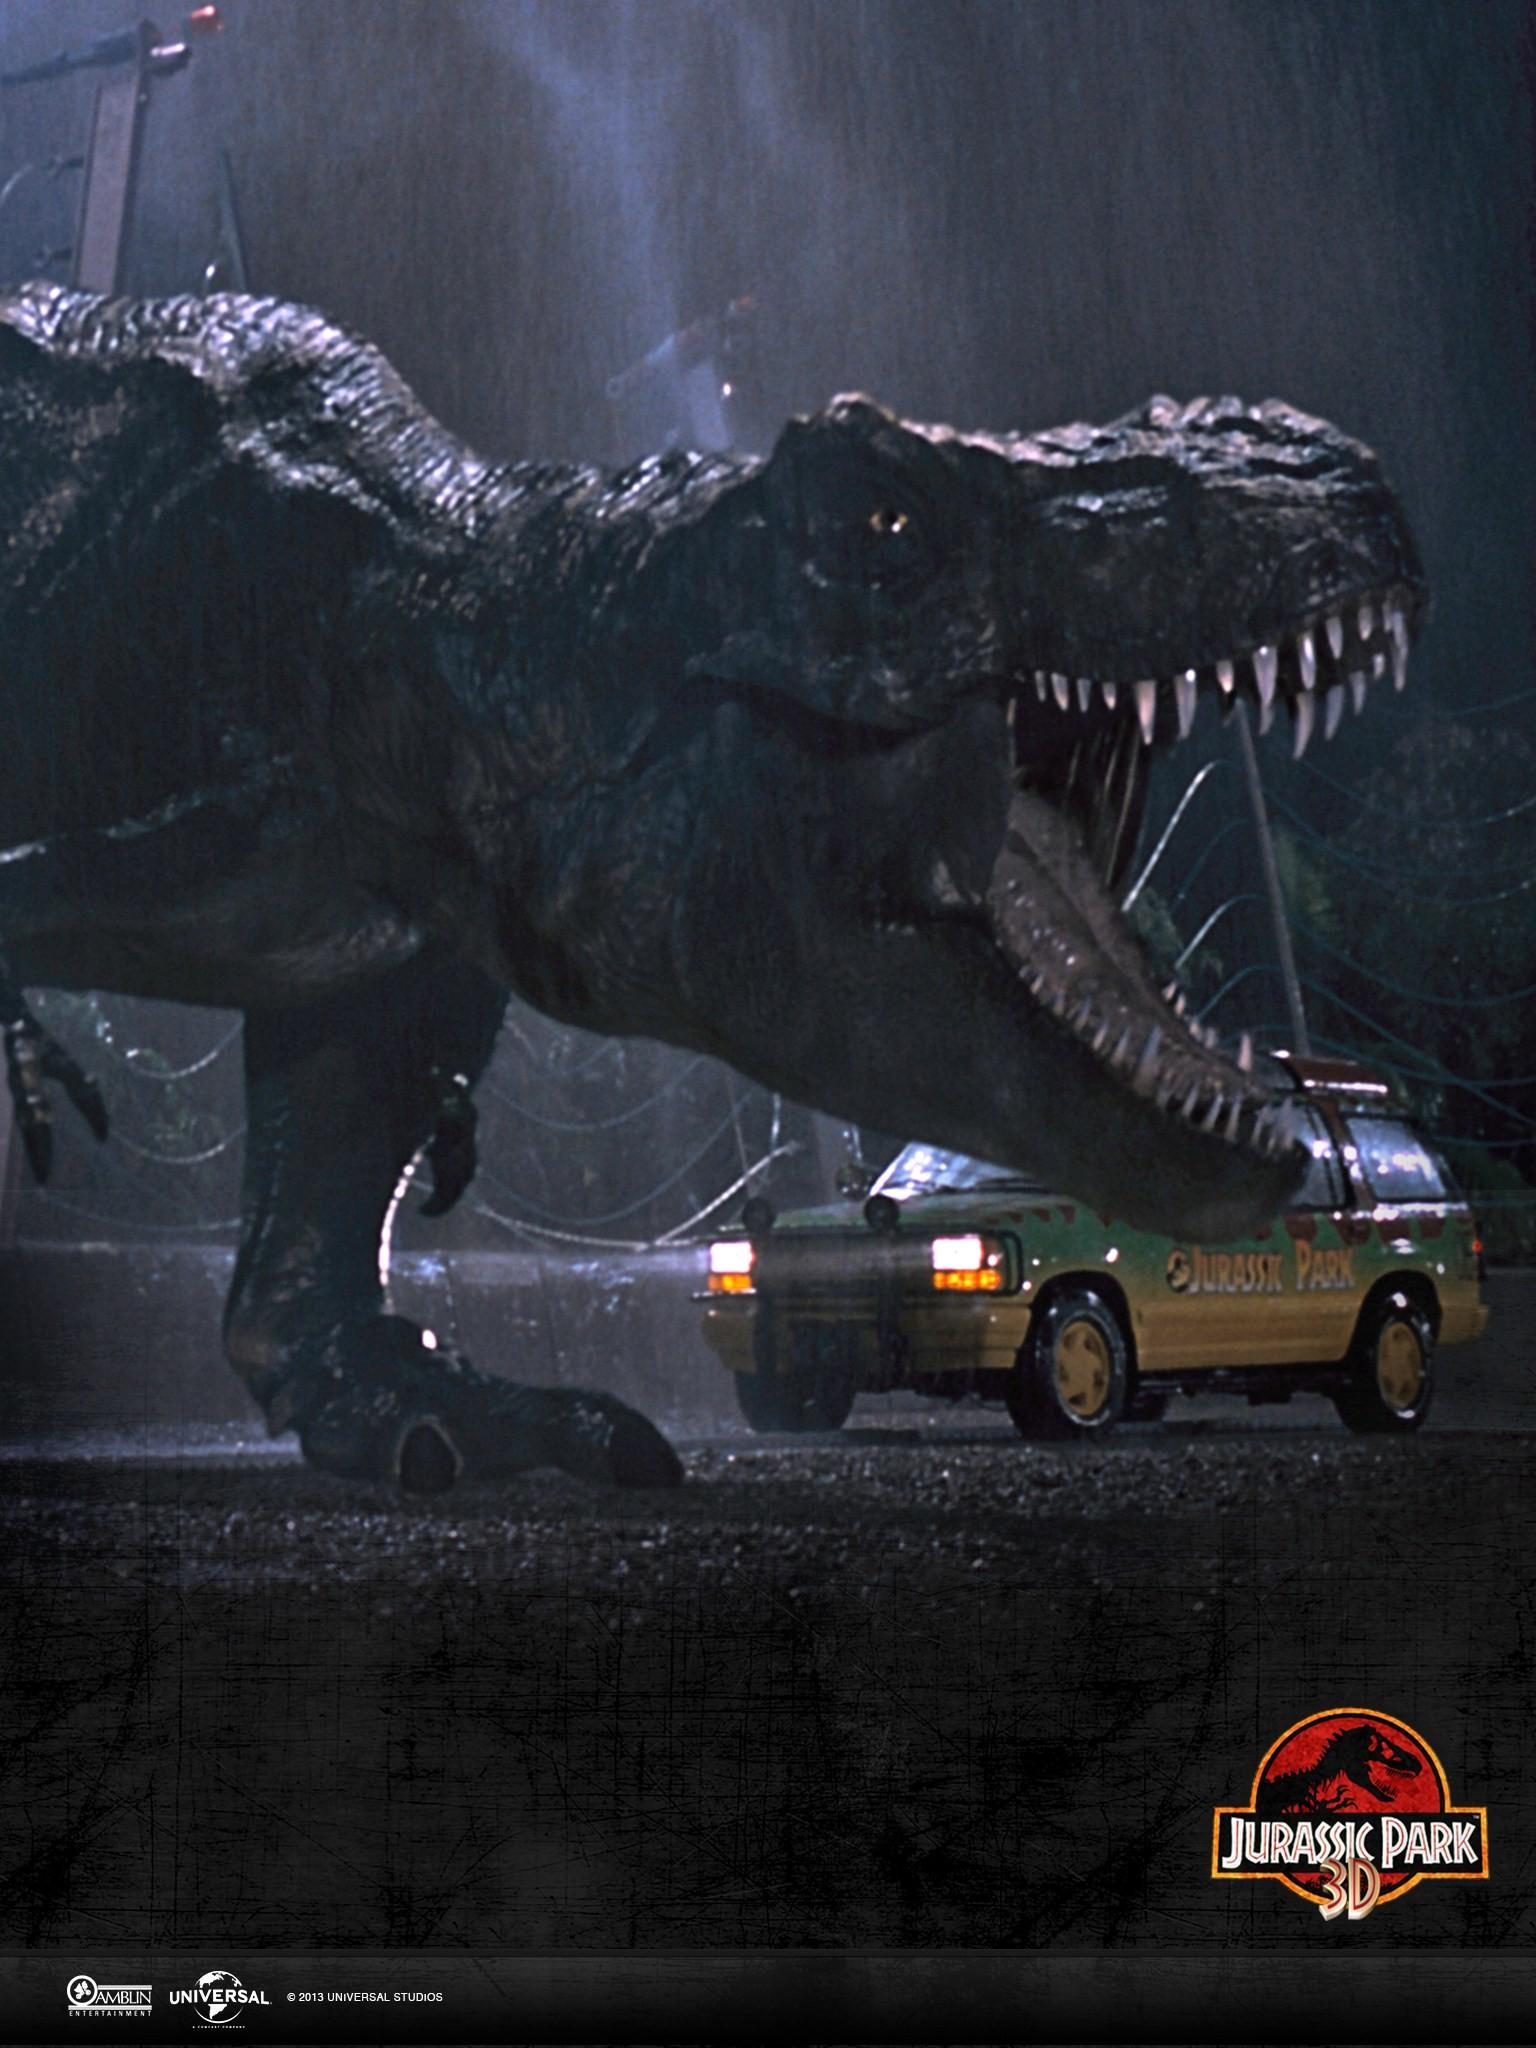 1920x1080 Jurassic Park T-rex Wallpapers Wide For Desktop Wallpaper 1920 x 1080 px 623.08 KB